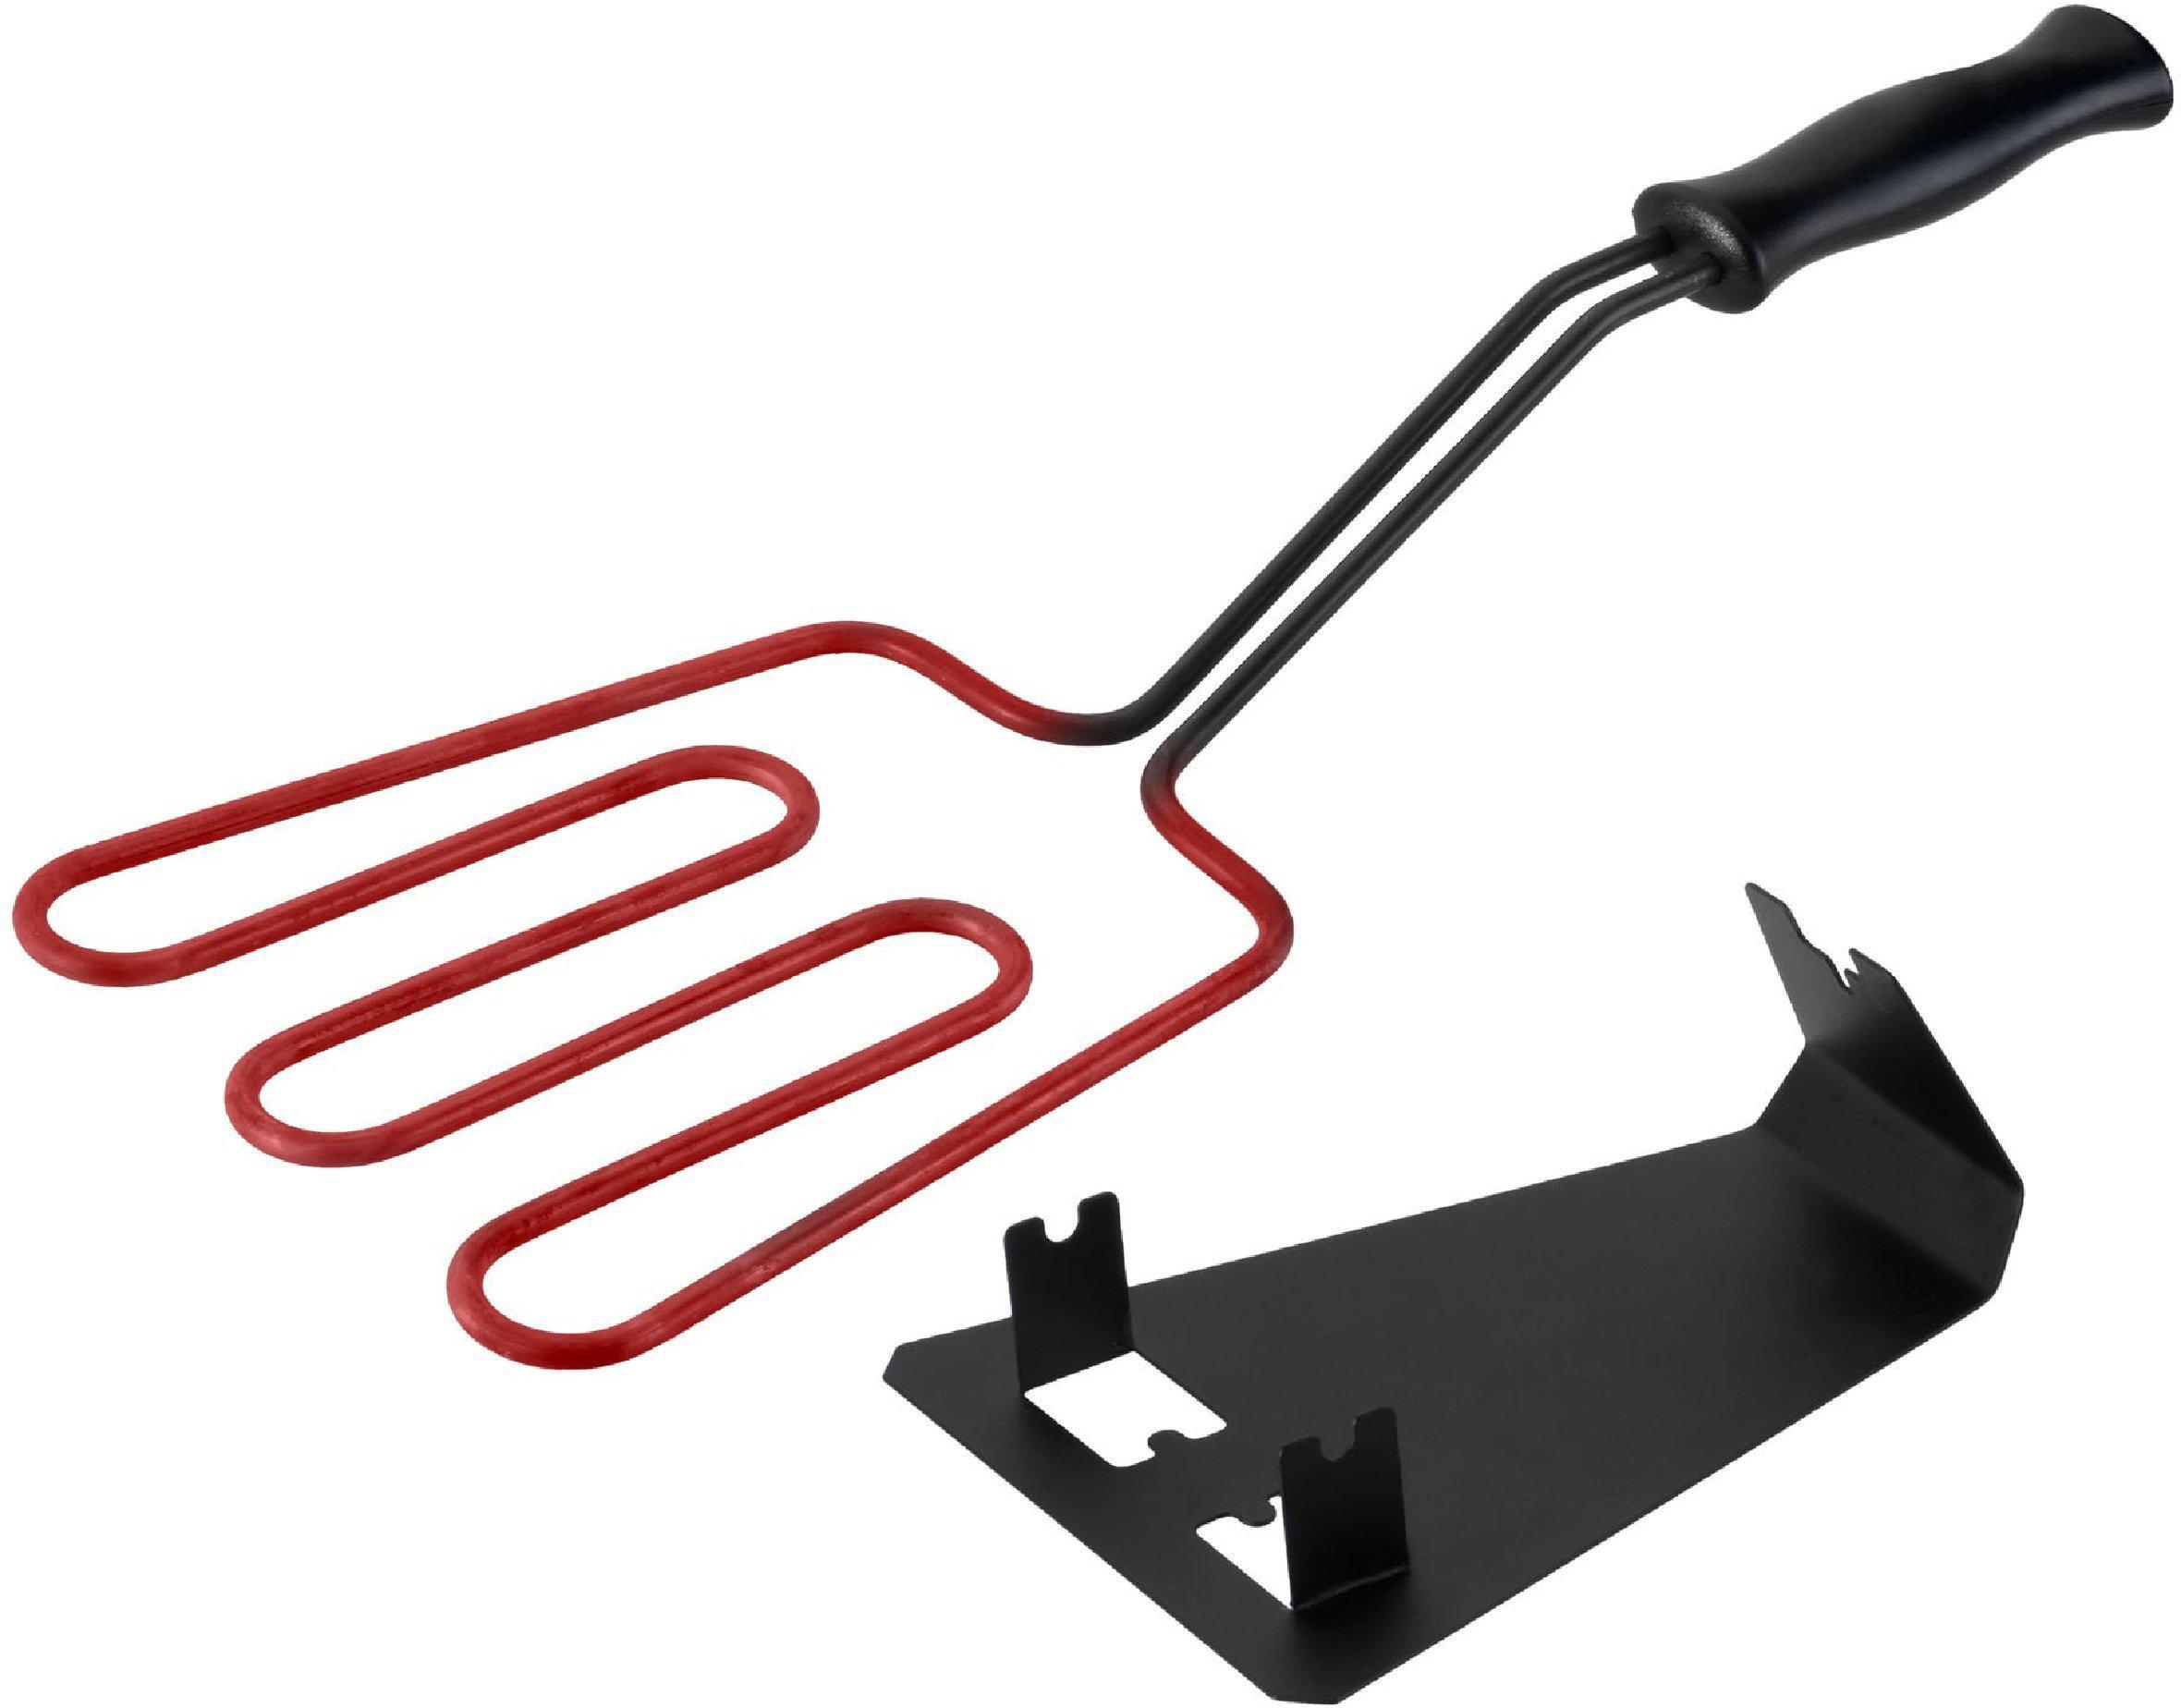 Efbe-Schott Elektro-Grillanzünder Grillkohleanzünder GA500